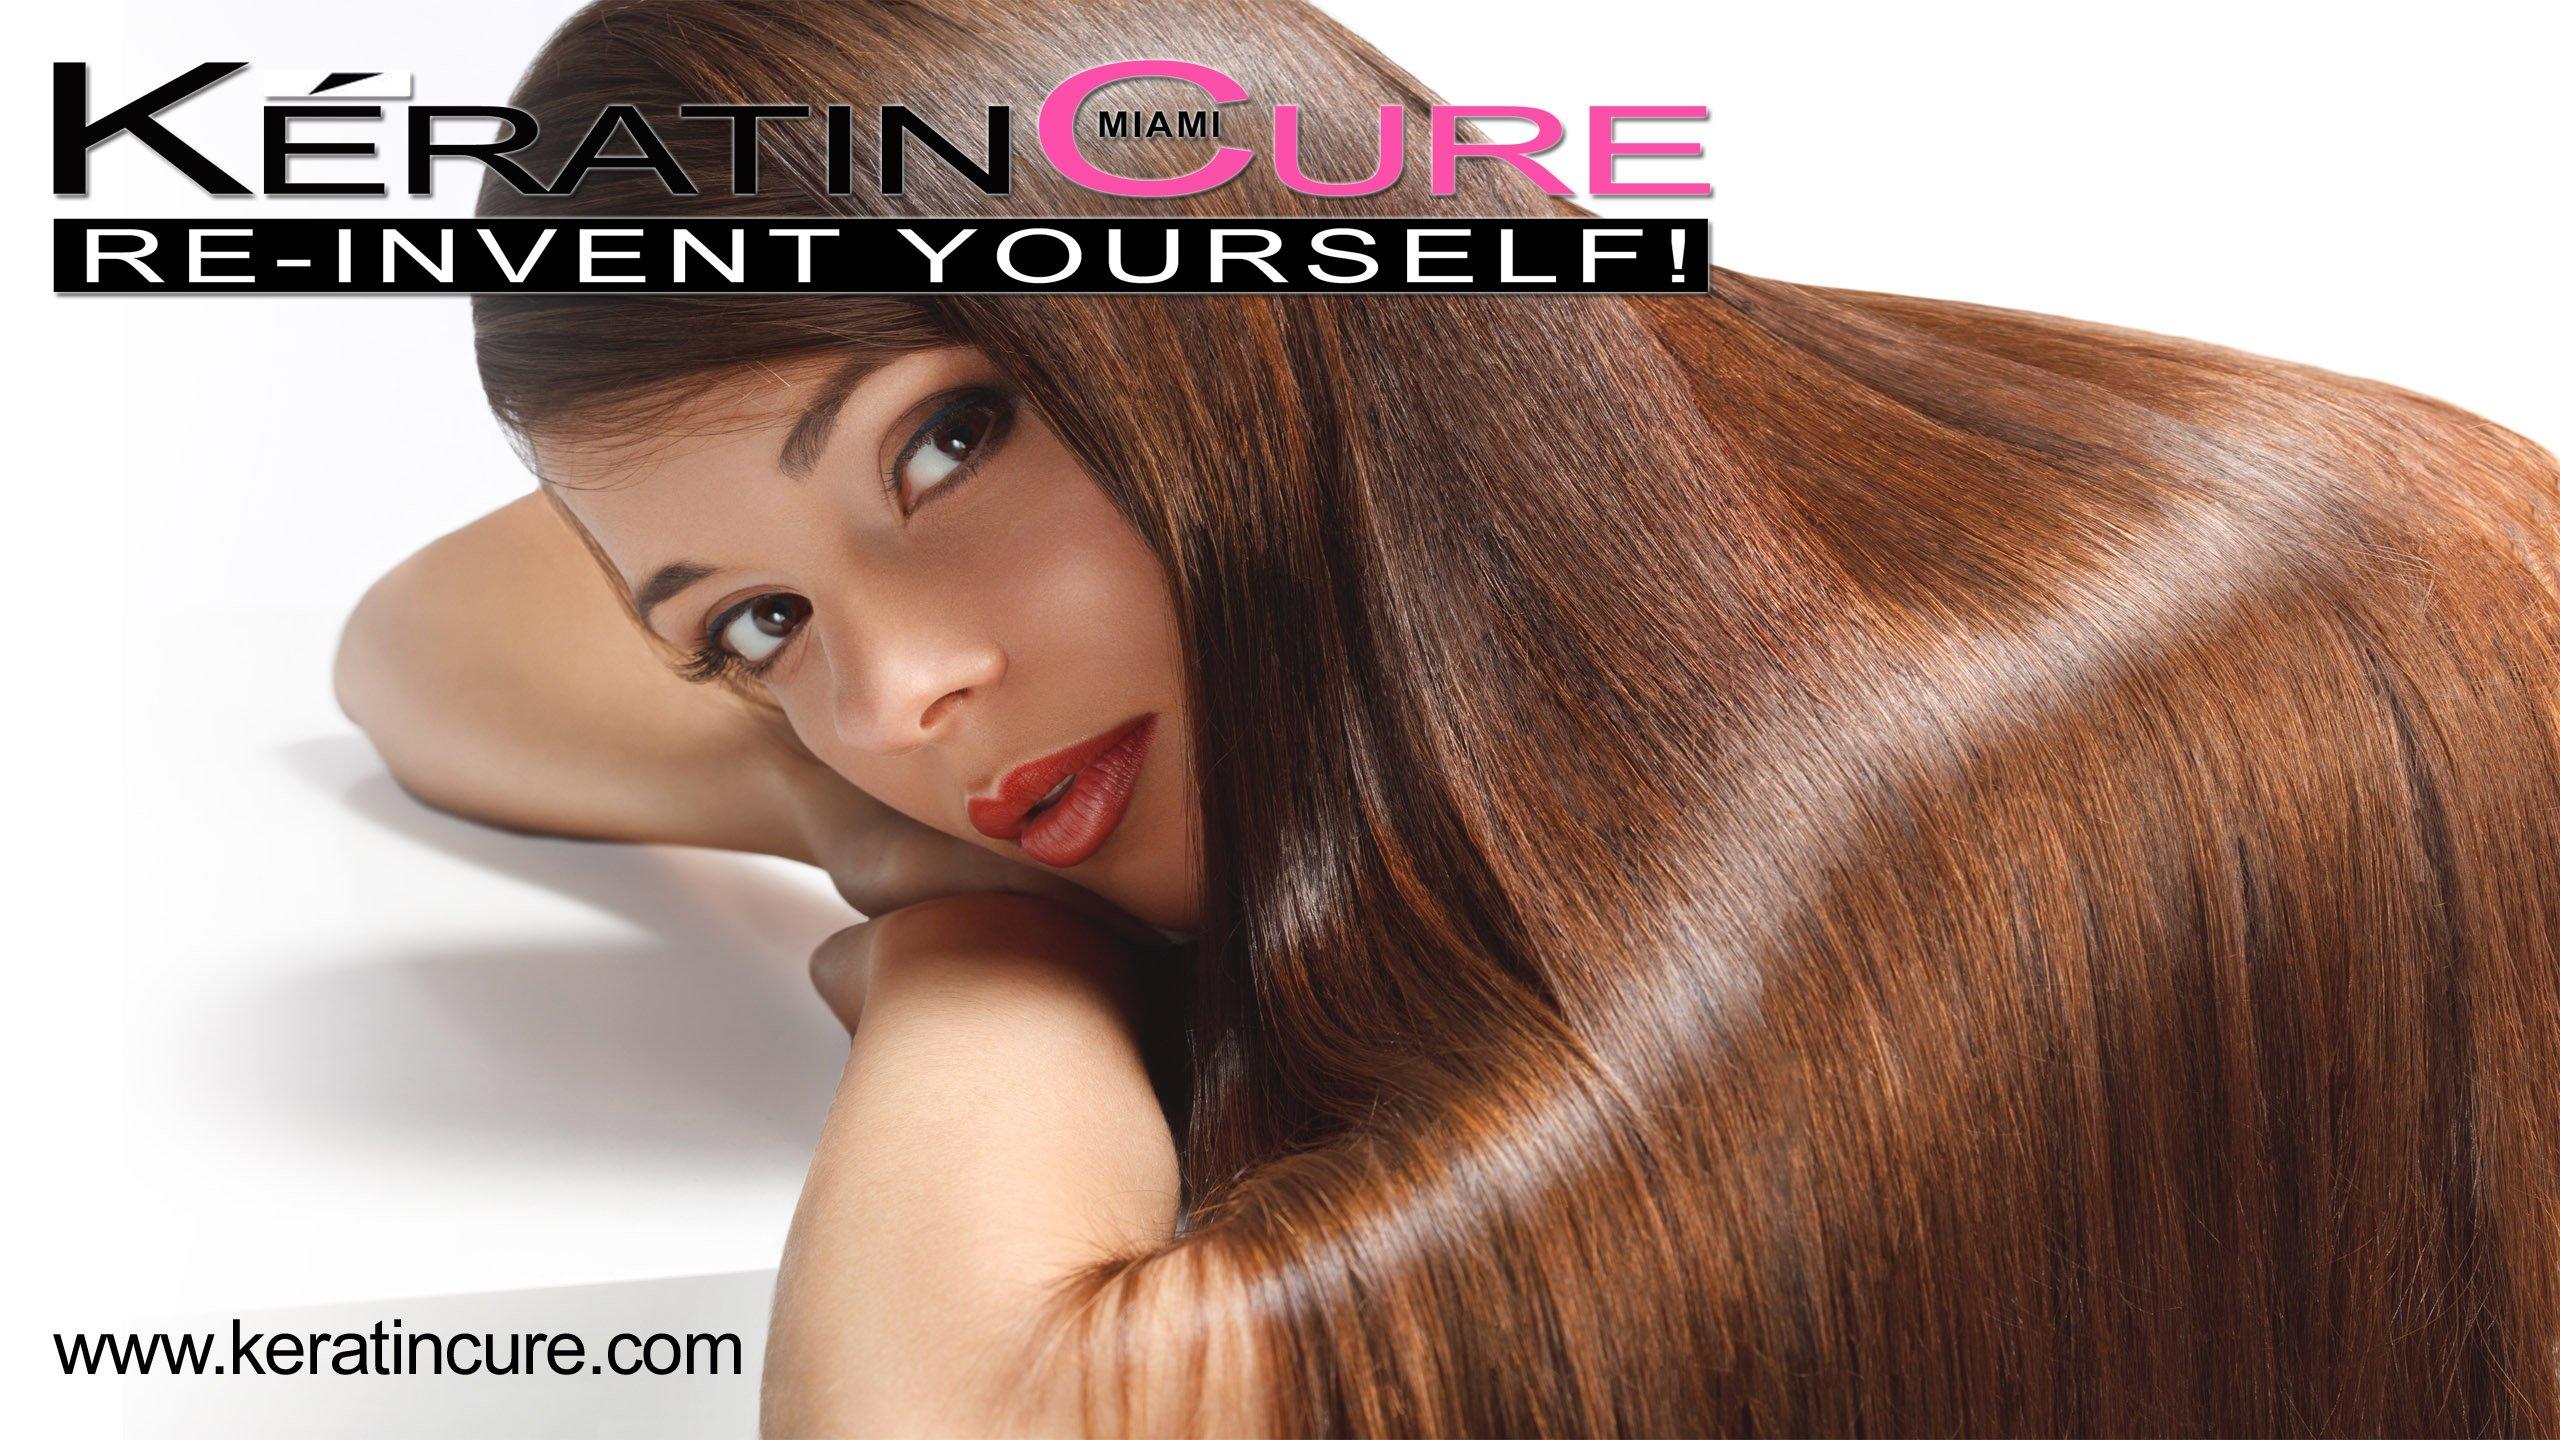 Keratin Cure -Color & Keratin Safe -SULFATE FREE- Shampoo & Conditioner #3 #4 Set Bio-Brazilian Post Daily Use -Gold & Honey 960ml / 32.5 fl